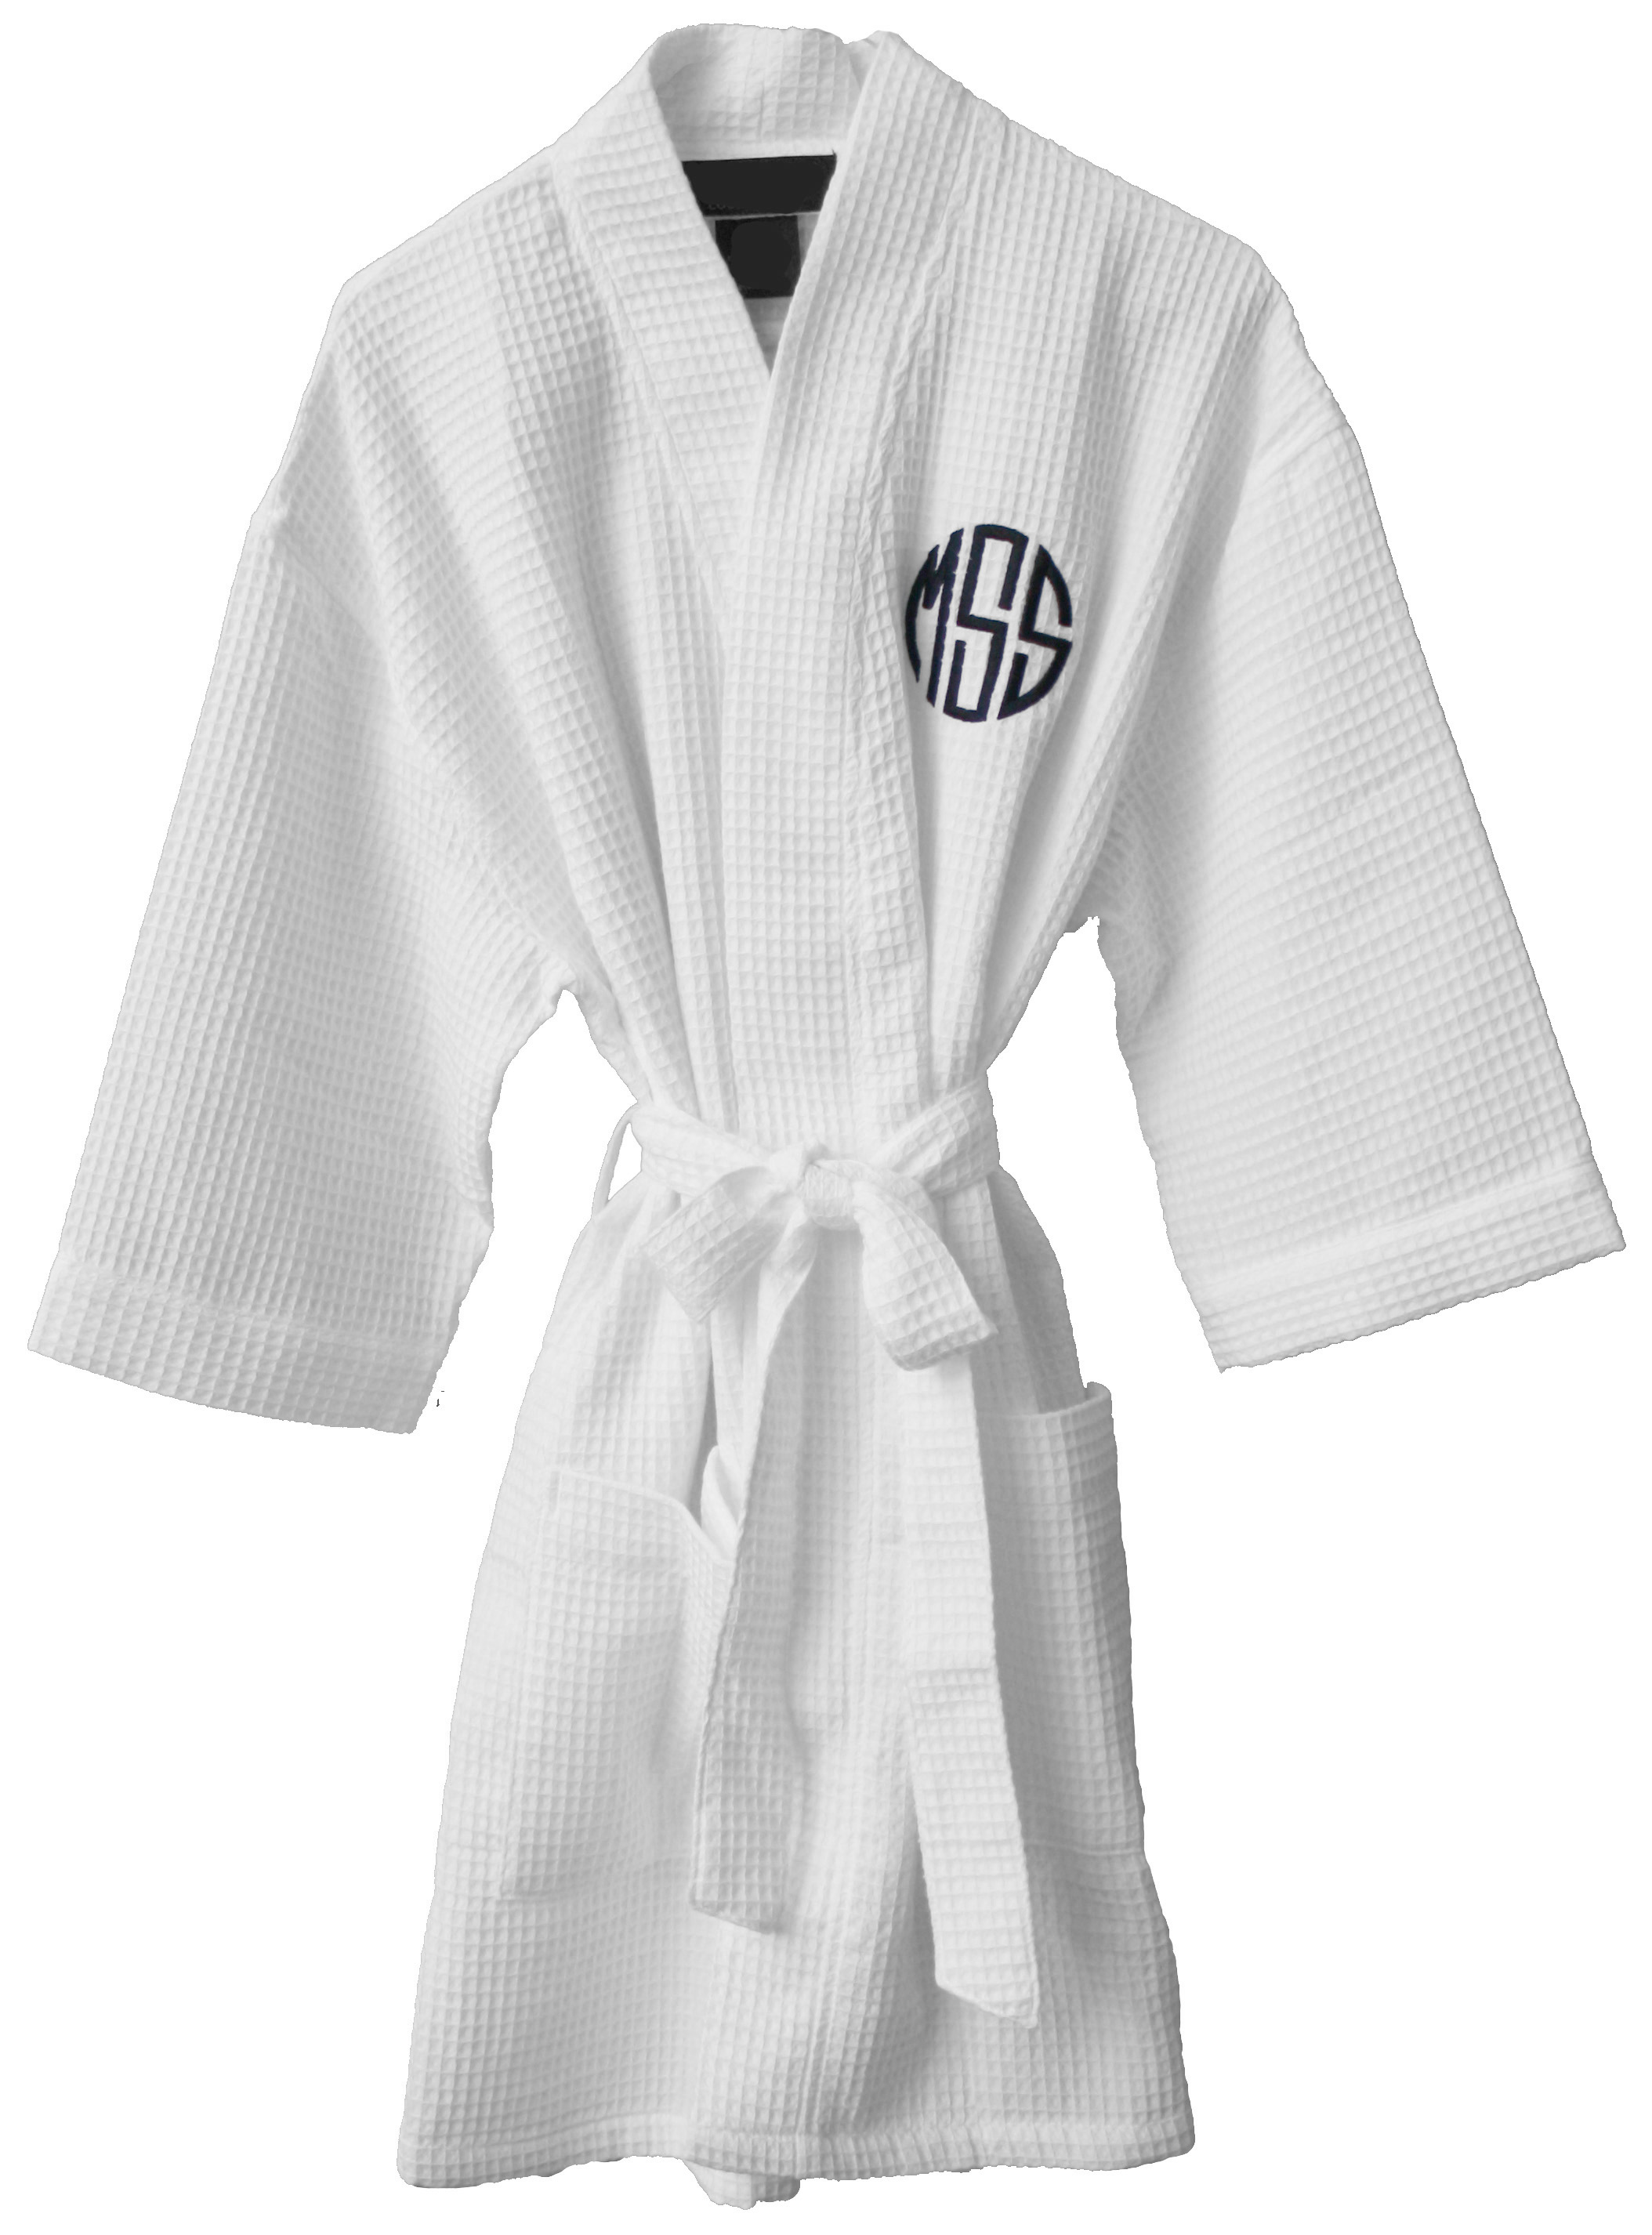 Monogrammed Cotton Waffle Weave Robe Justplaincute